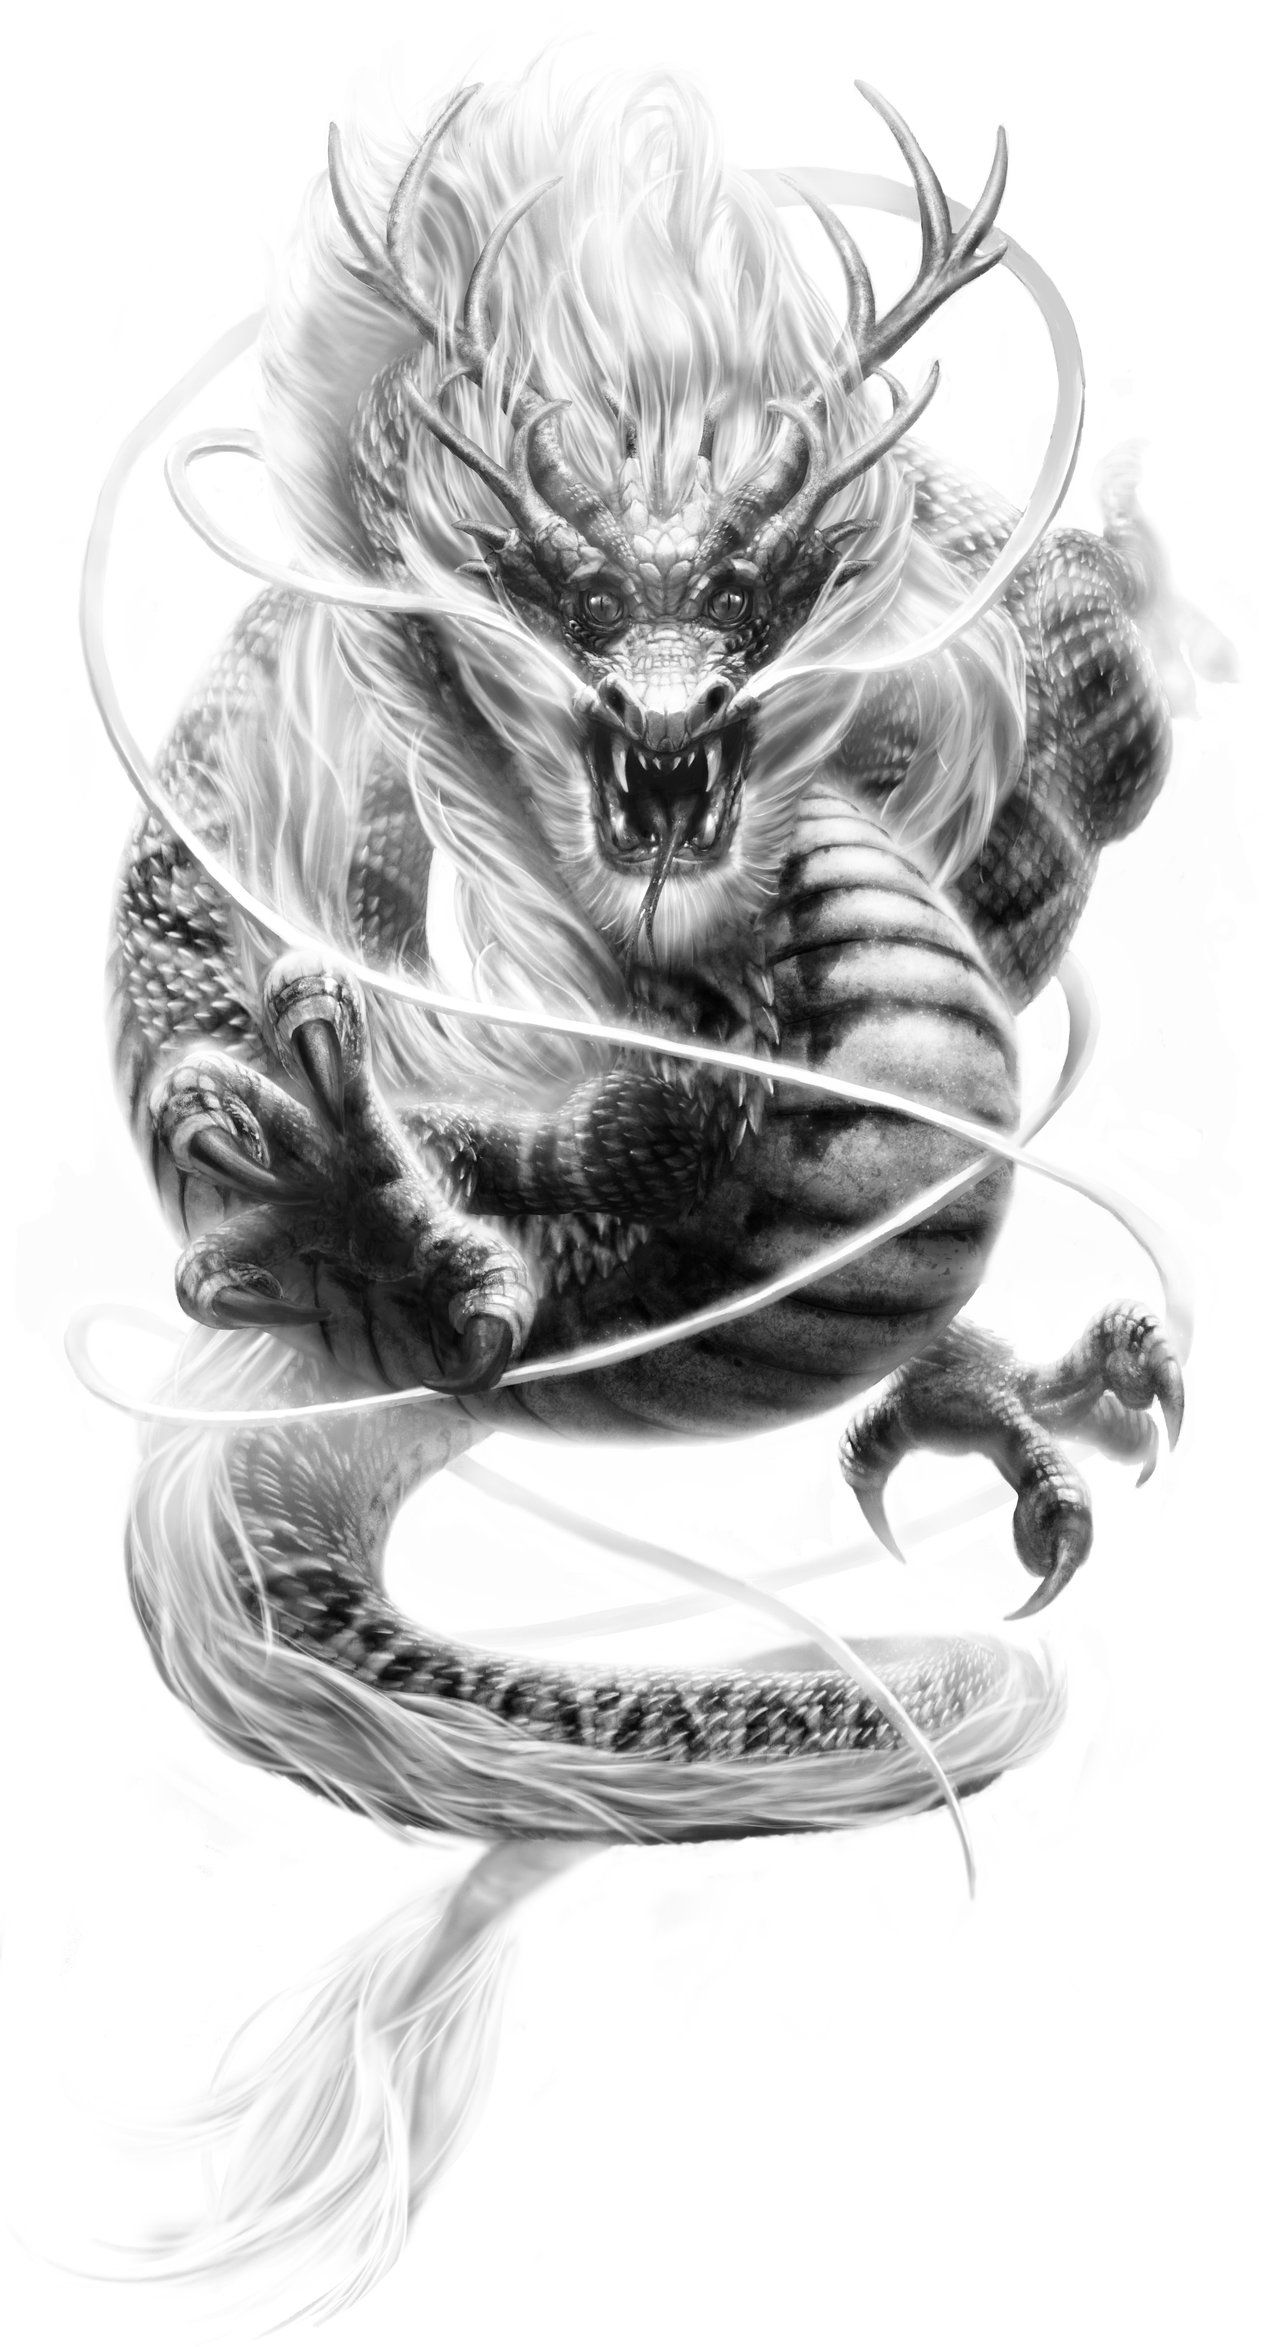 Phoenix Vs Dragon Wallpaper iPhone